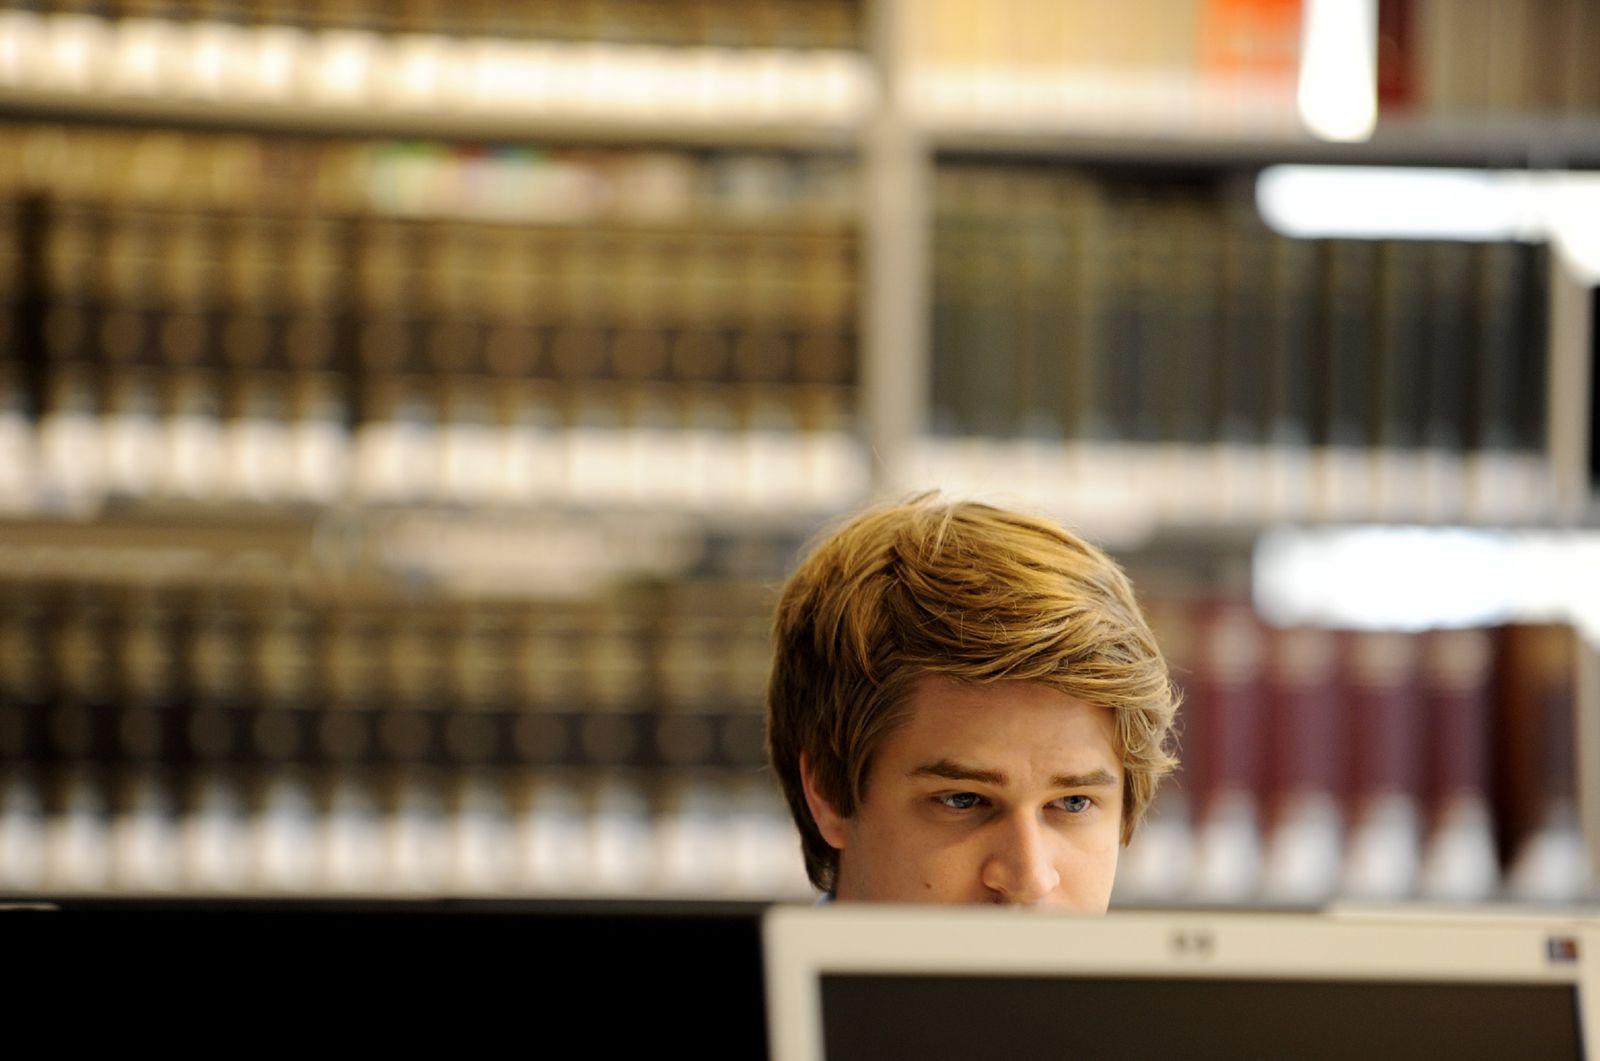 Student Bibliothek Bucerius Law School